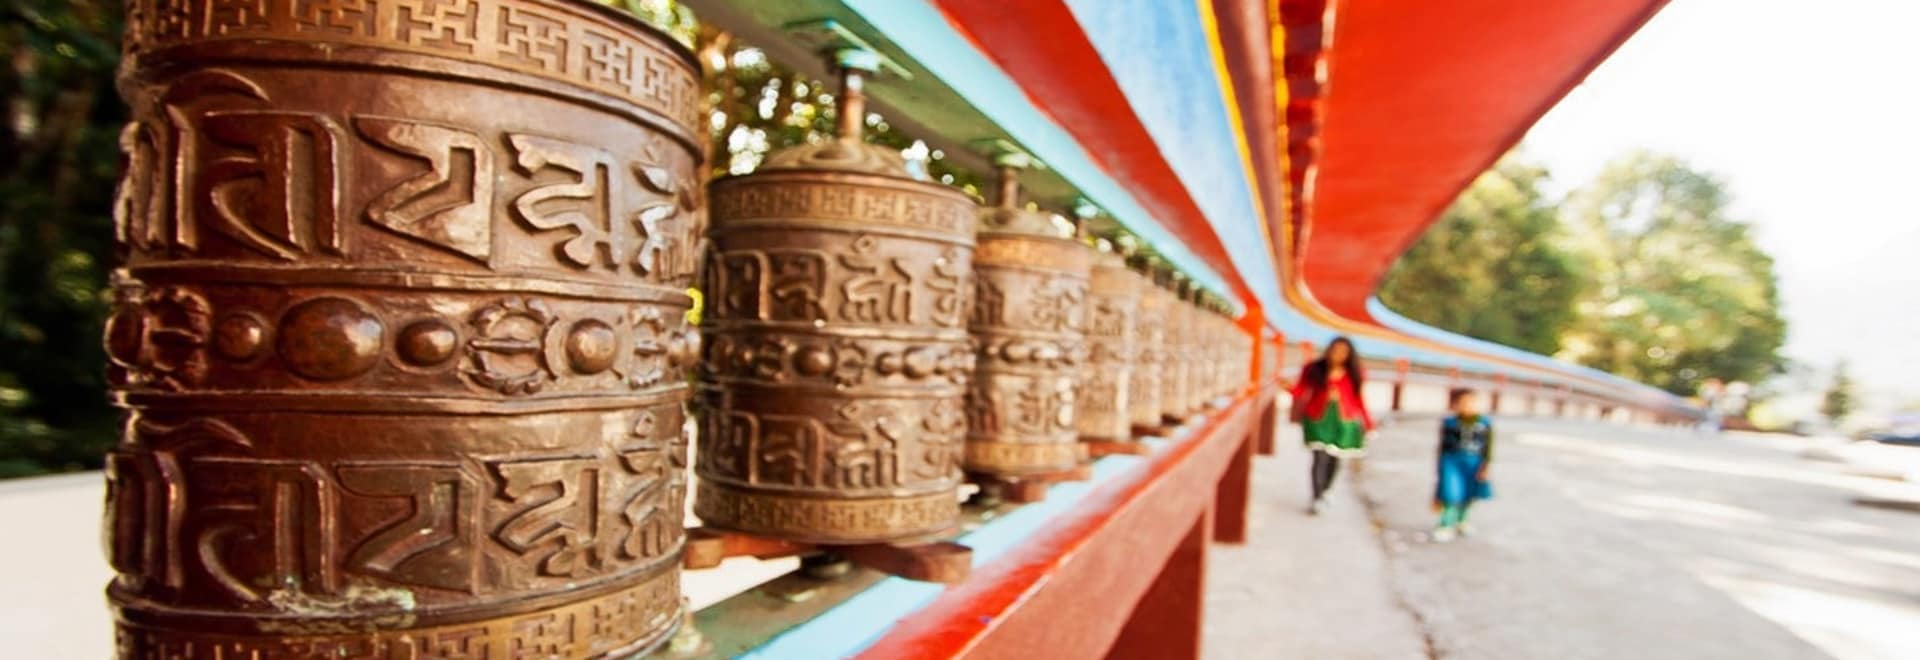 Sikkim-by_pranav_bhasin-flickr.jpg